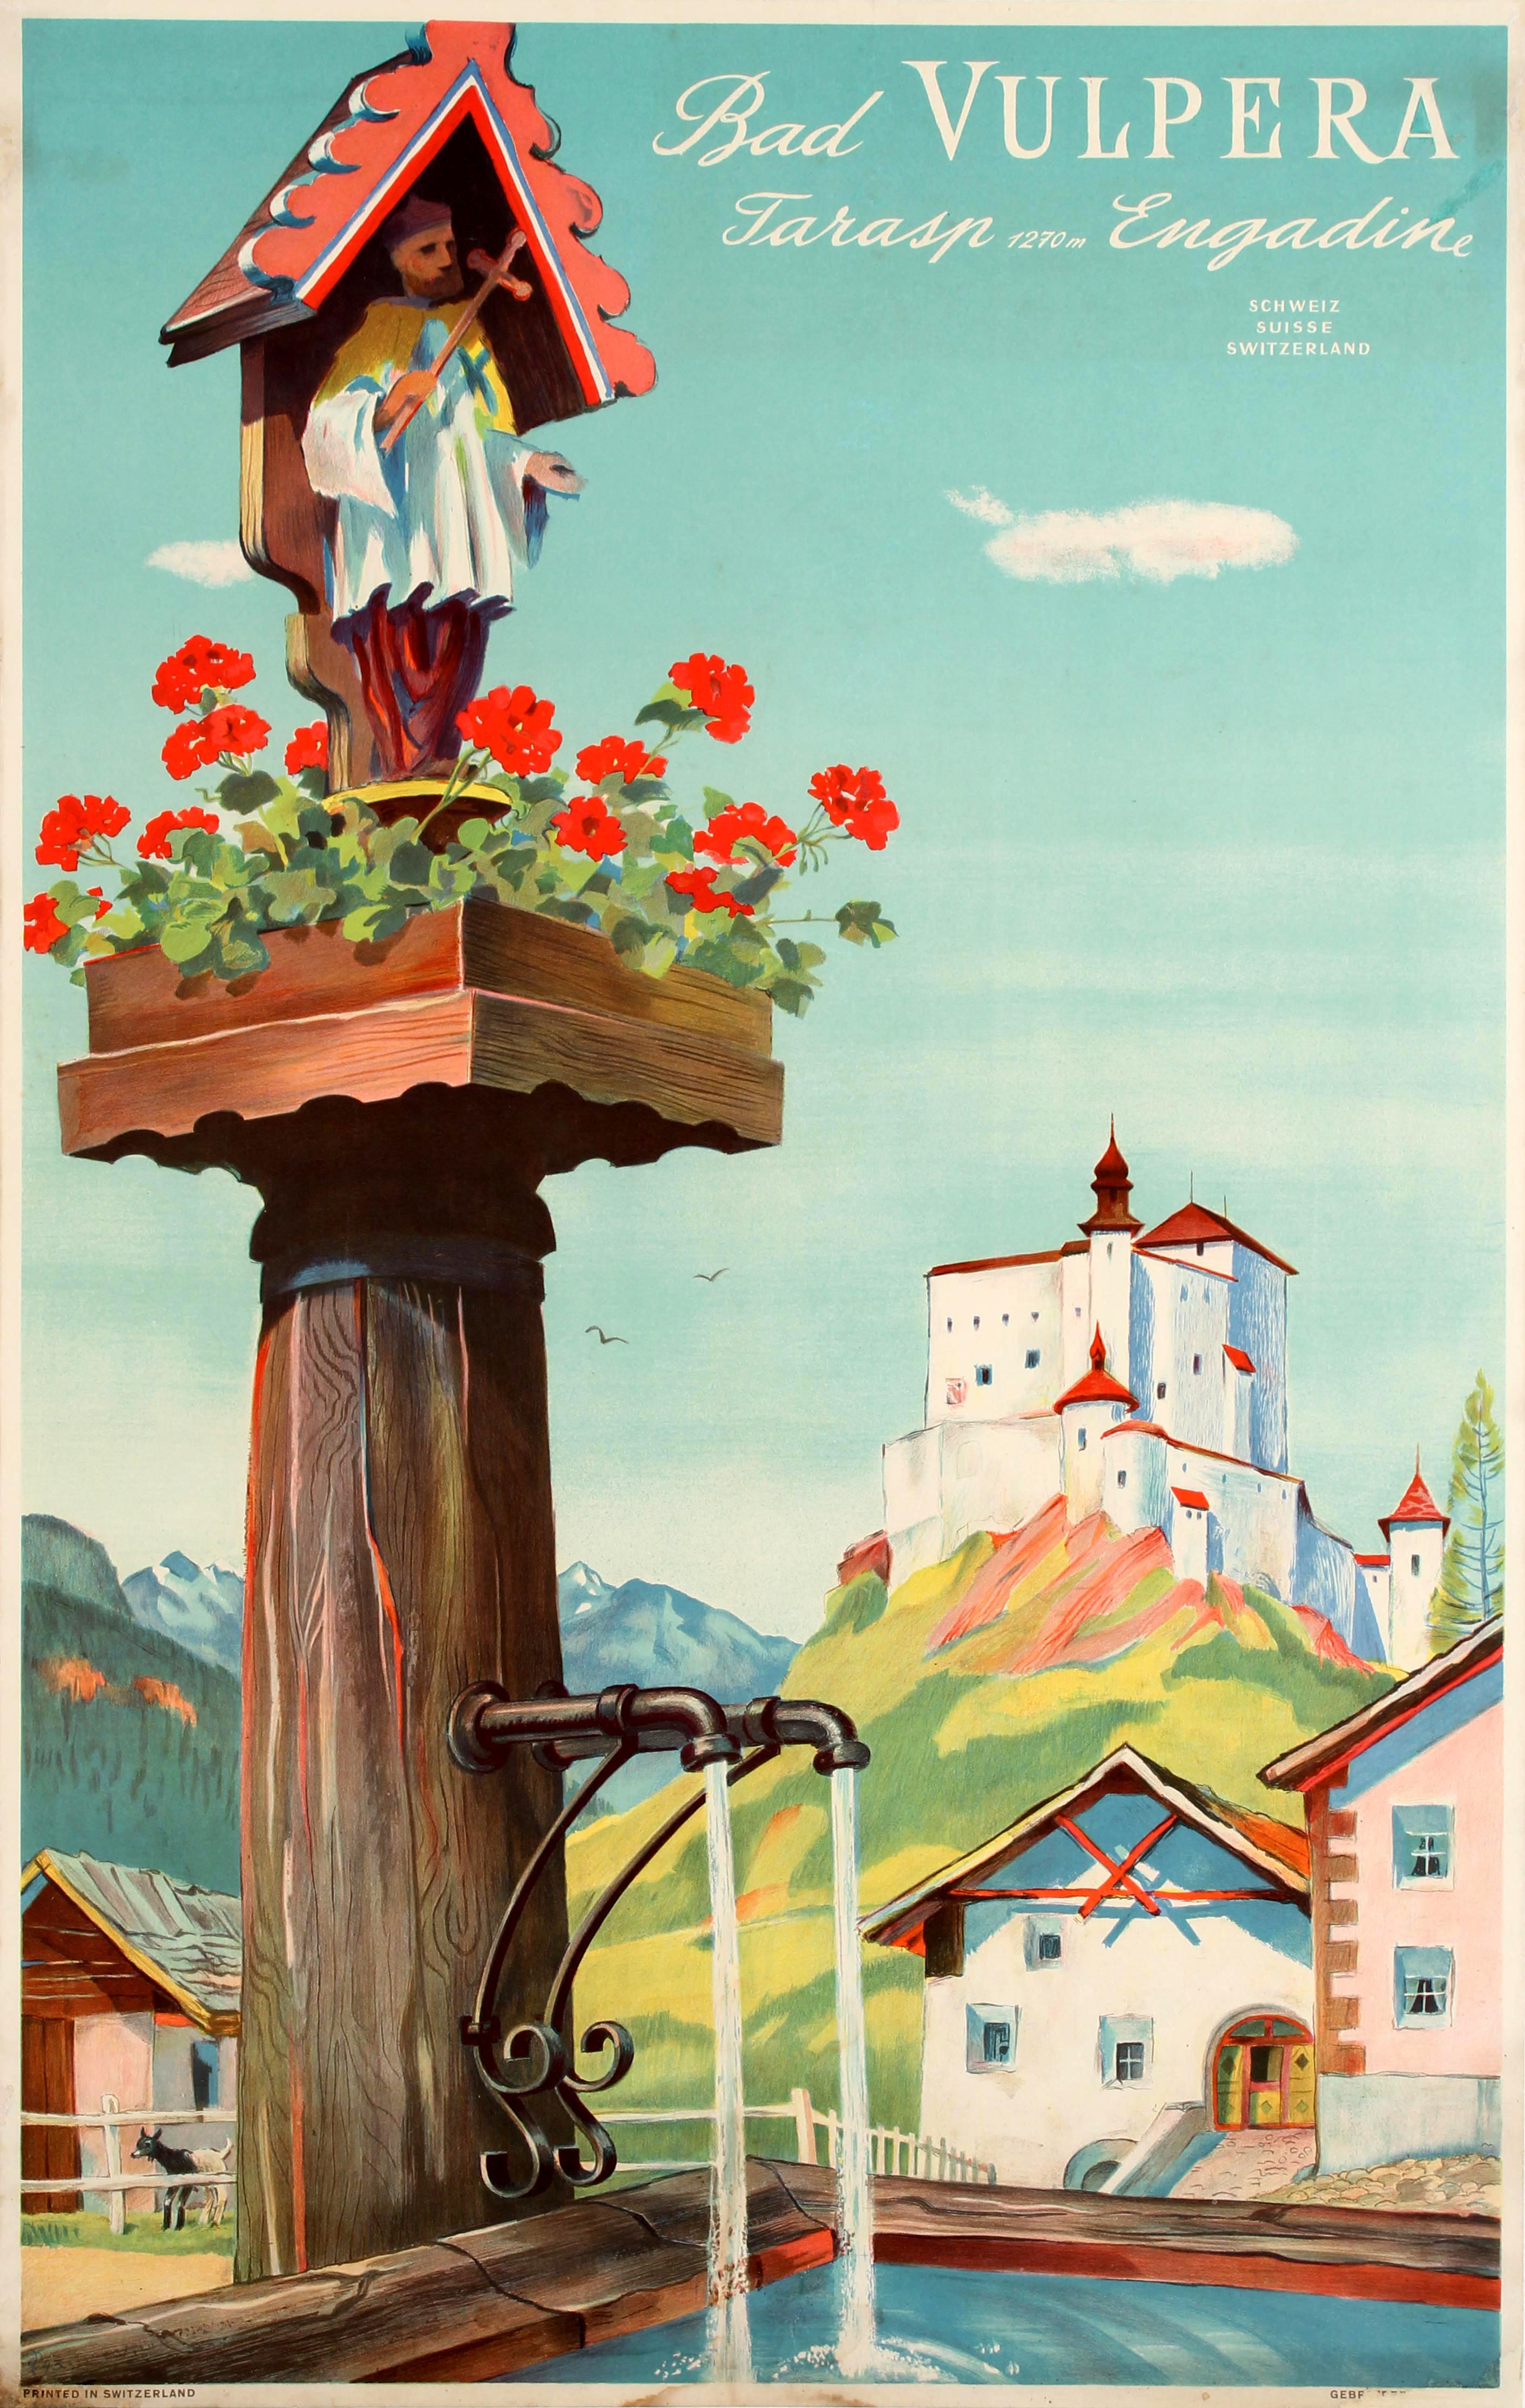 Travel Poster Bad Vulpera Tarasp Engadin Switzerland